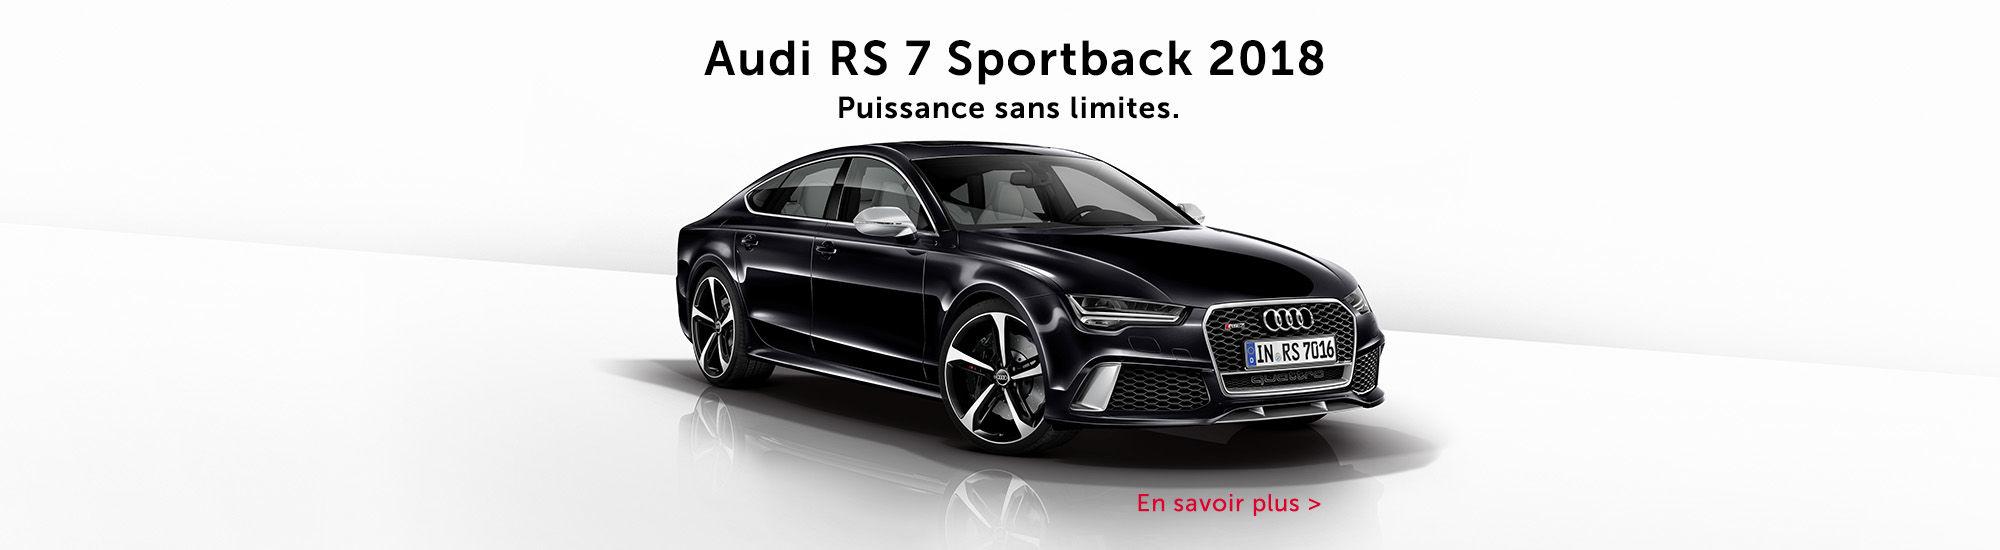 Audi RS7 sporstback 2018